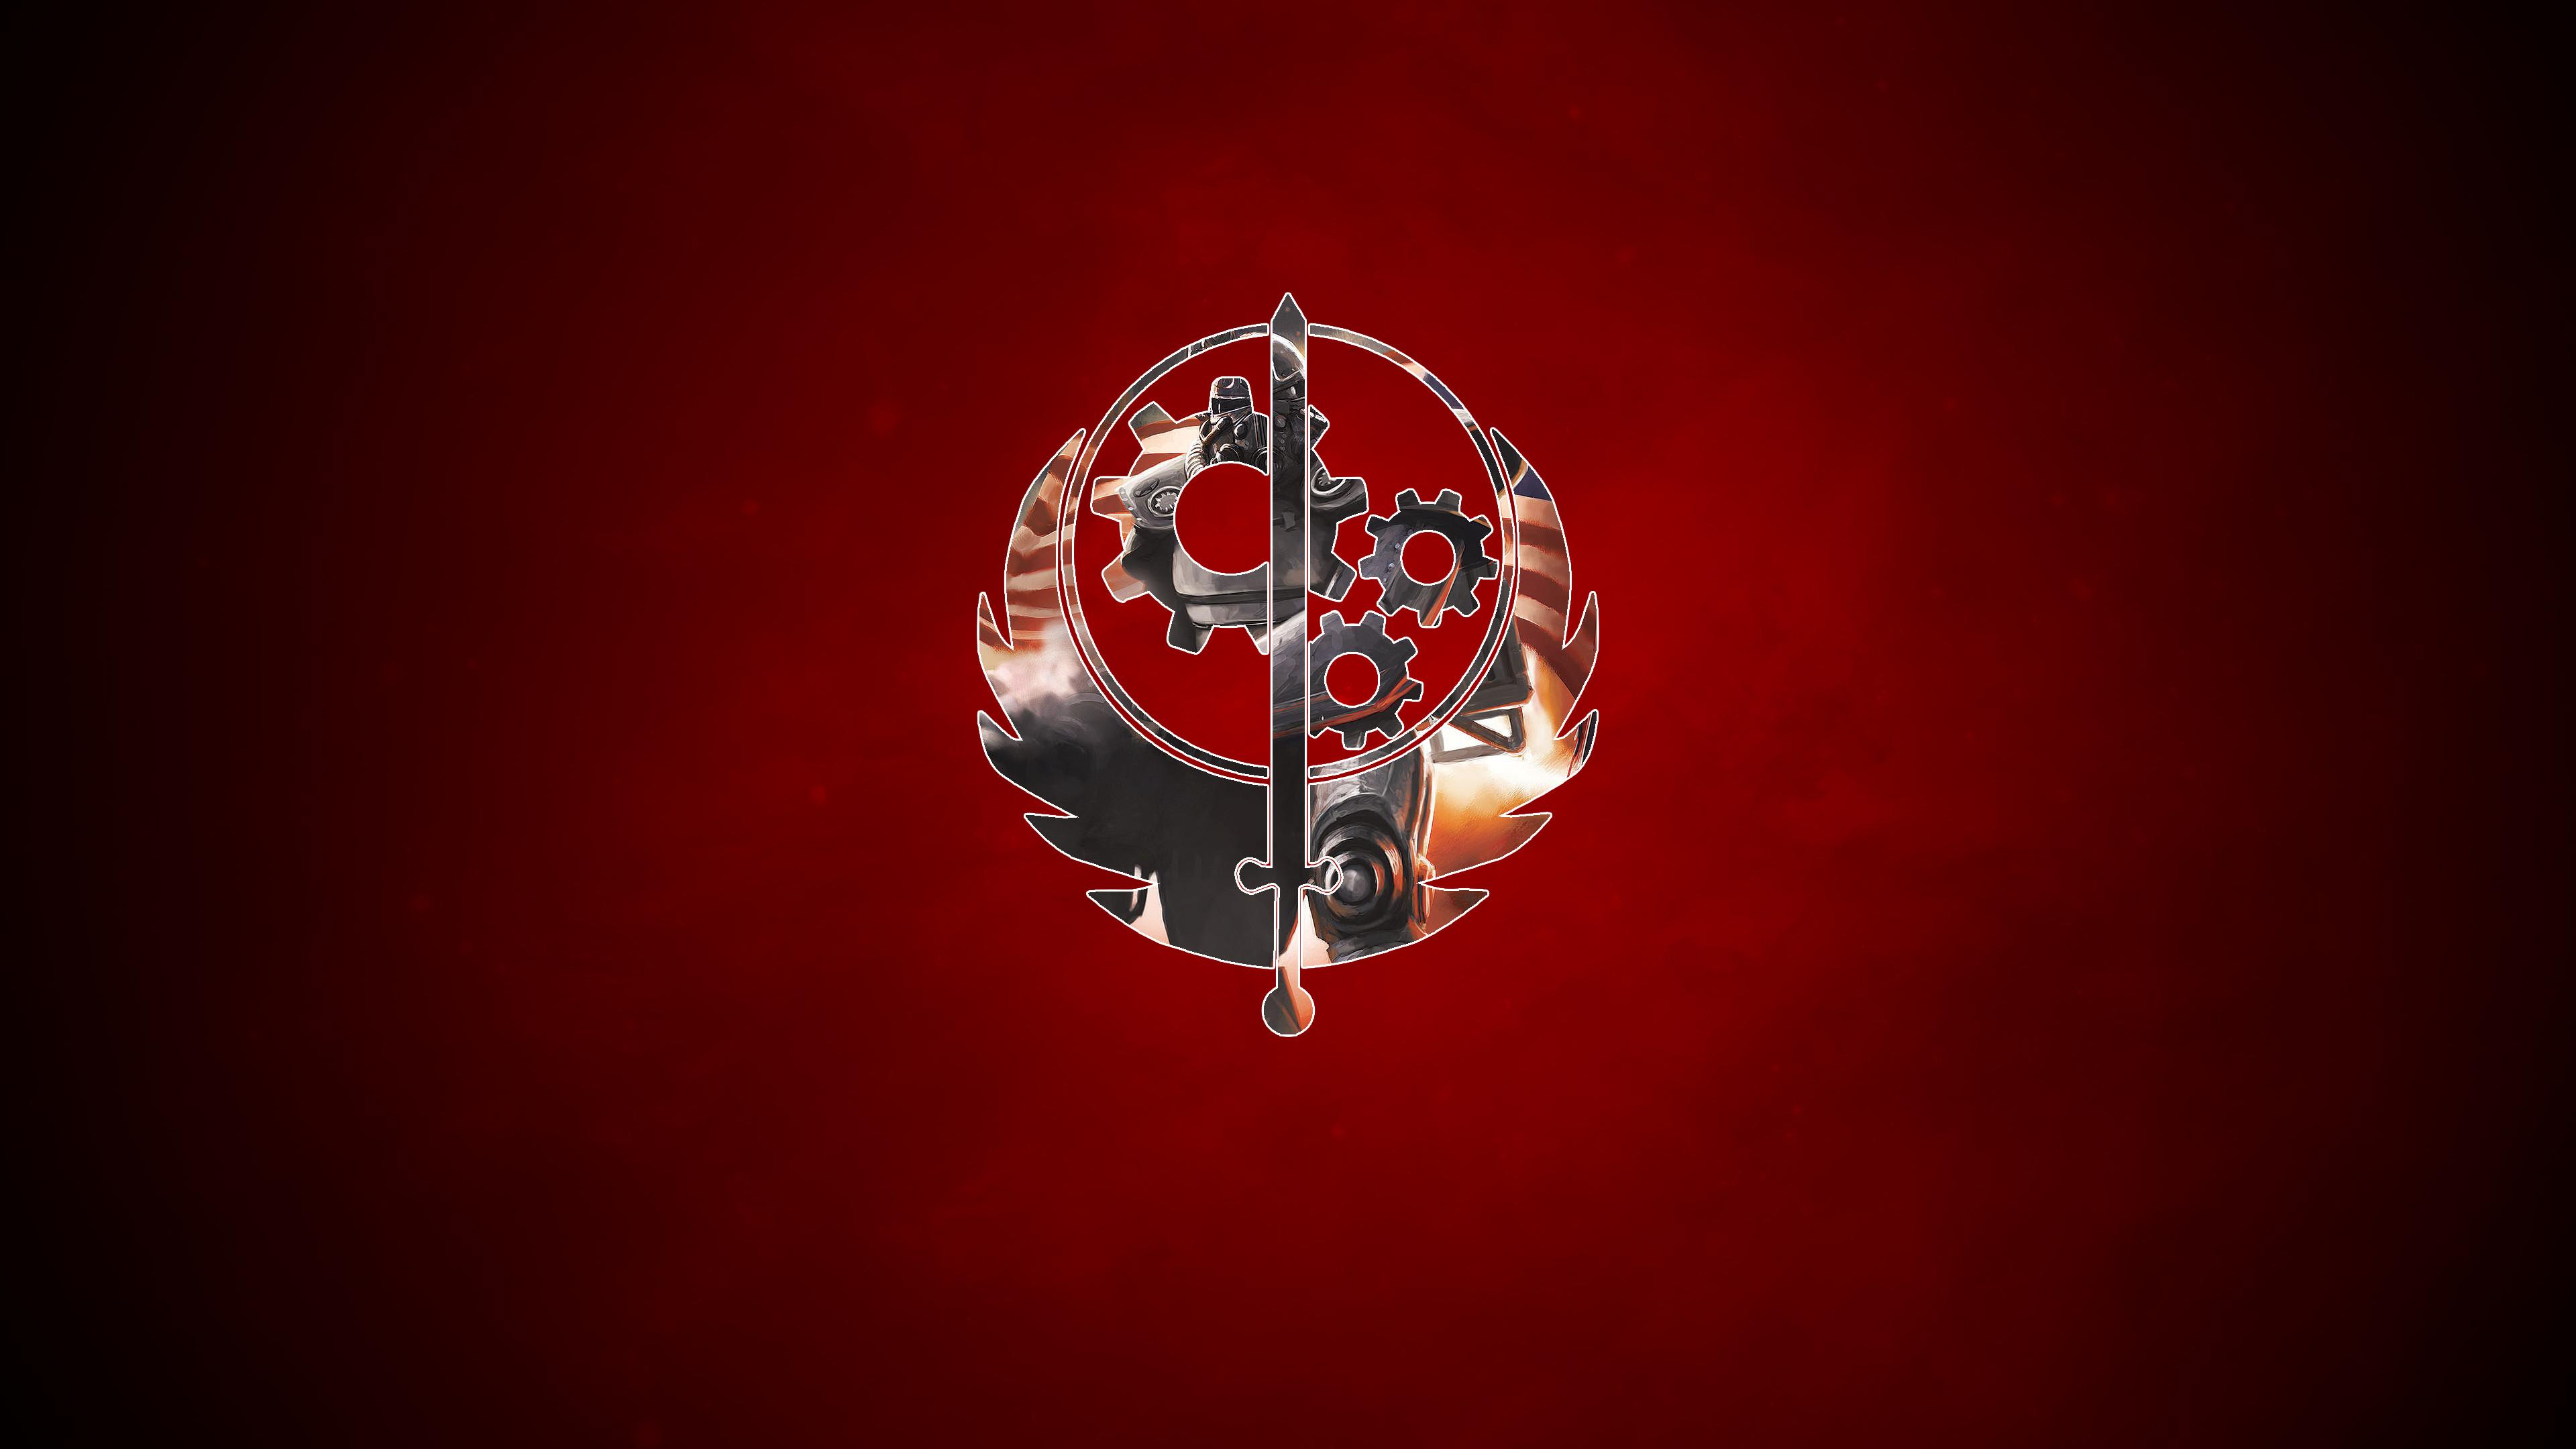 The Brotherhood of Steel 4K Logo Wallpaper. 4K Fallout 4 Wallpapers